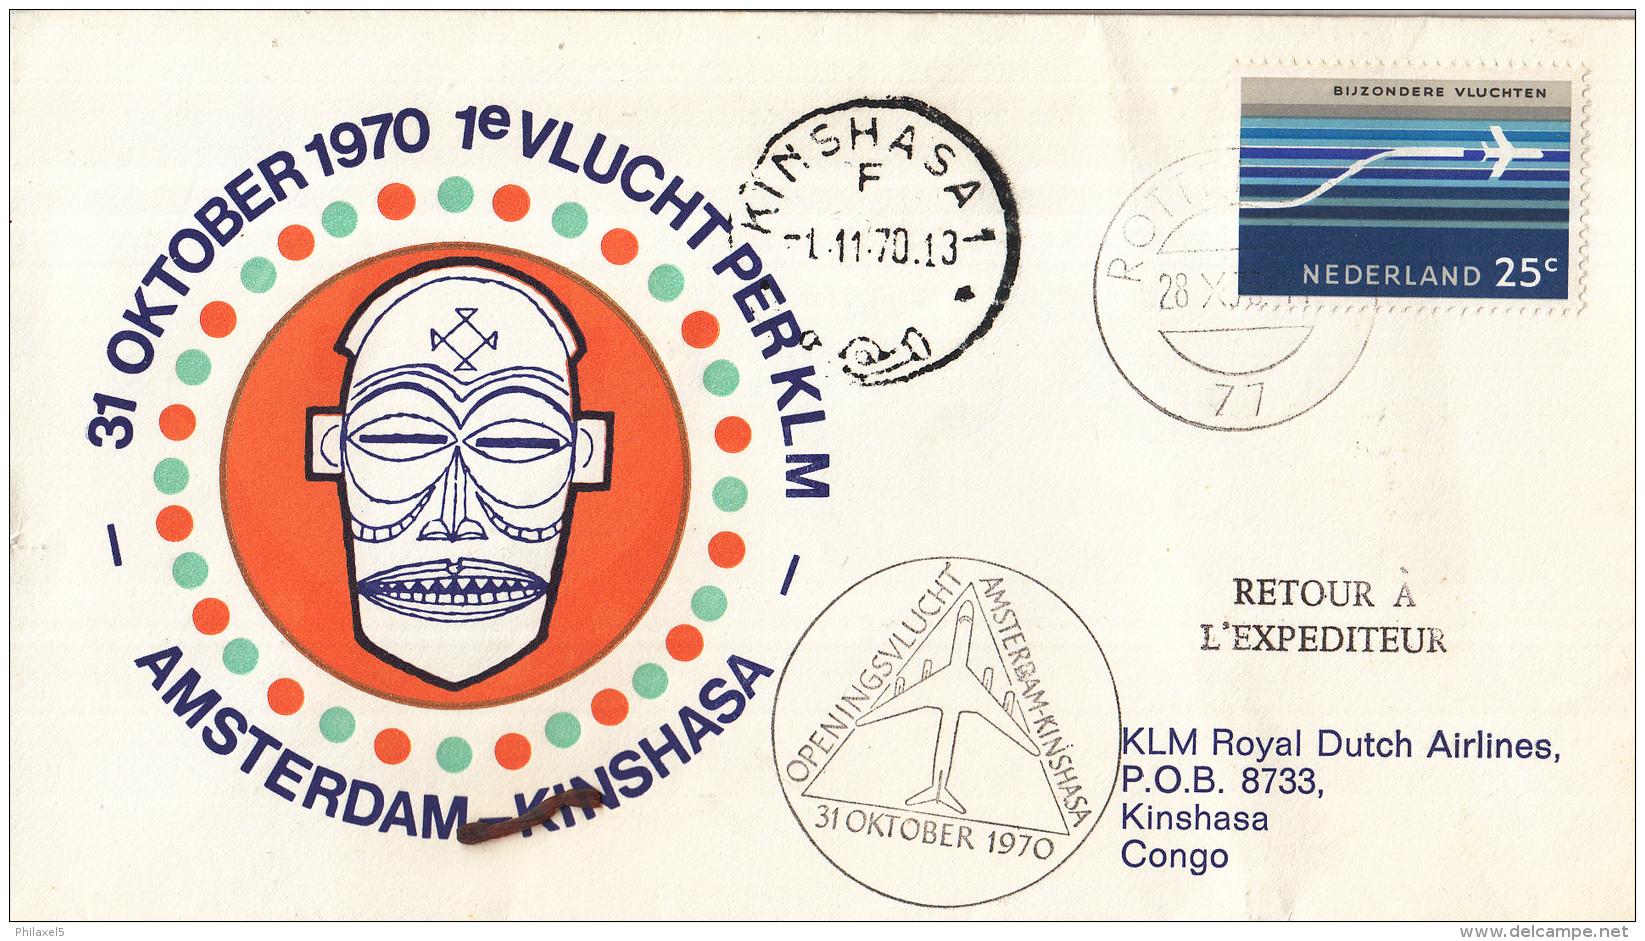 Nederland - 1ste Vlucht - 13 Oktober 1970 - Amsterdam-Kinshasa - Vl. Hol. 827a - Marcofilie - EMA (Print Machine)